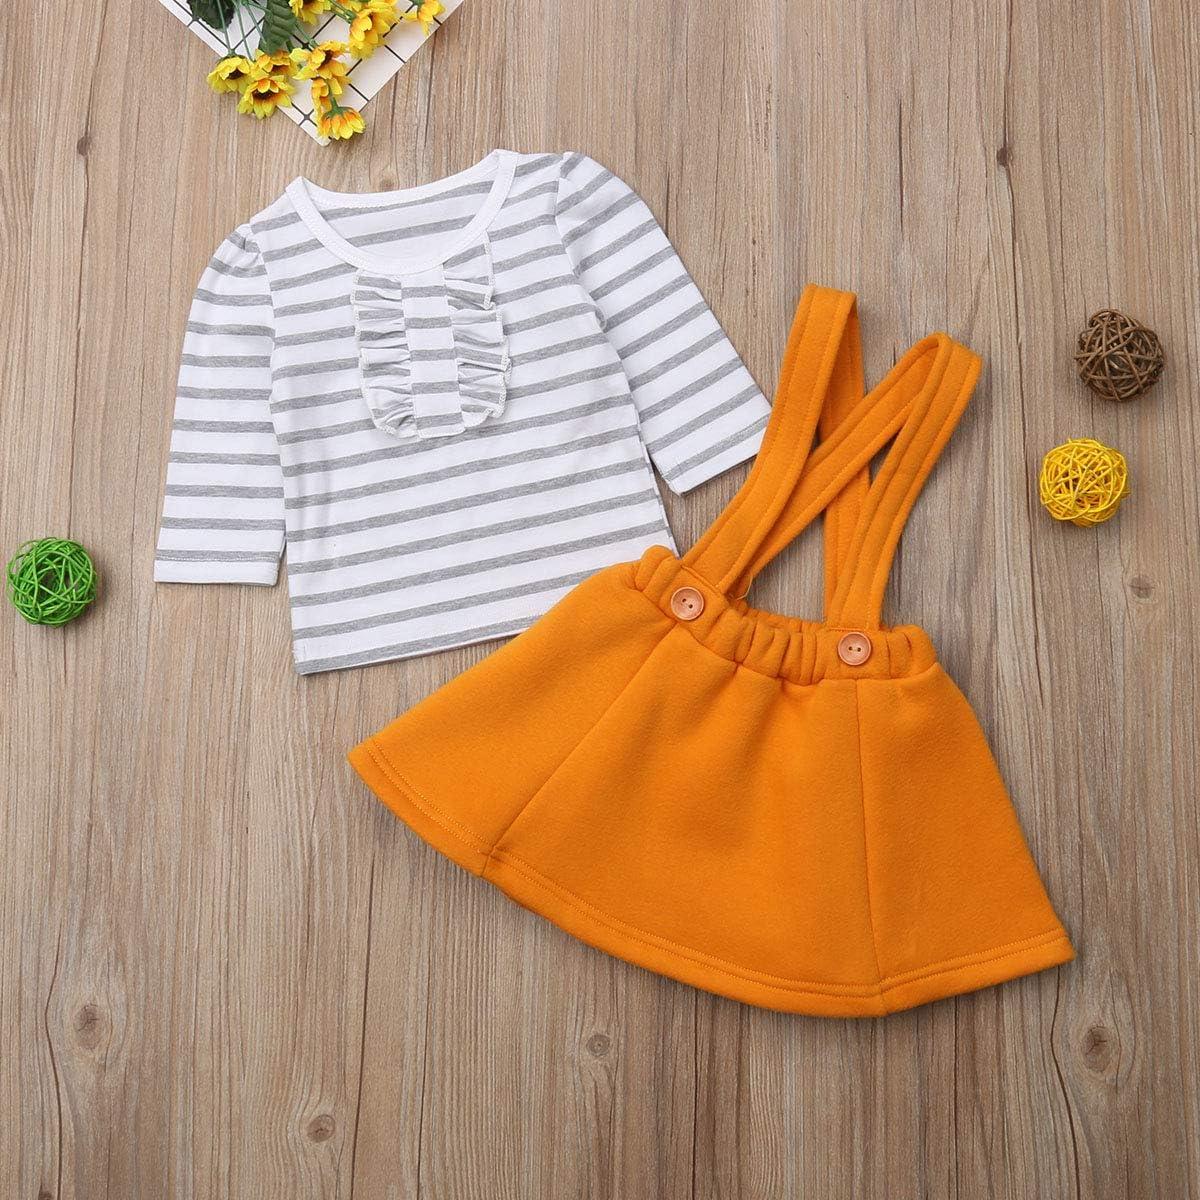 Suspender Skirt Clothing Set Toddler Baby Girls Striped Ruffle Cotton T-Shirt Tops